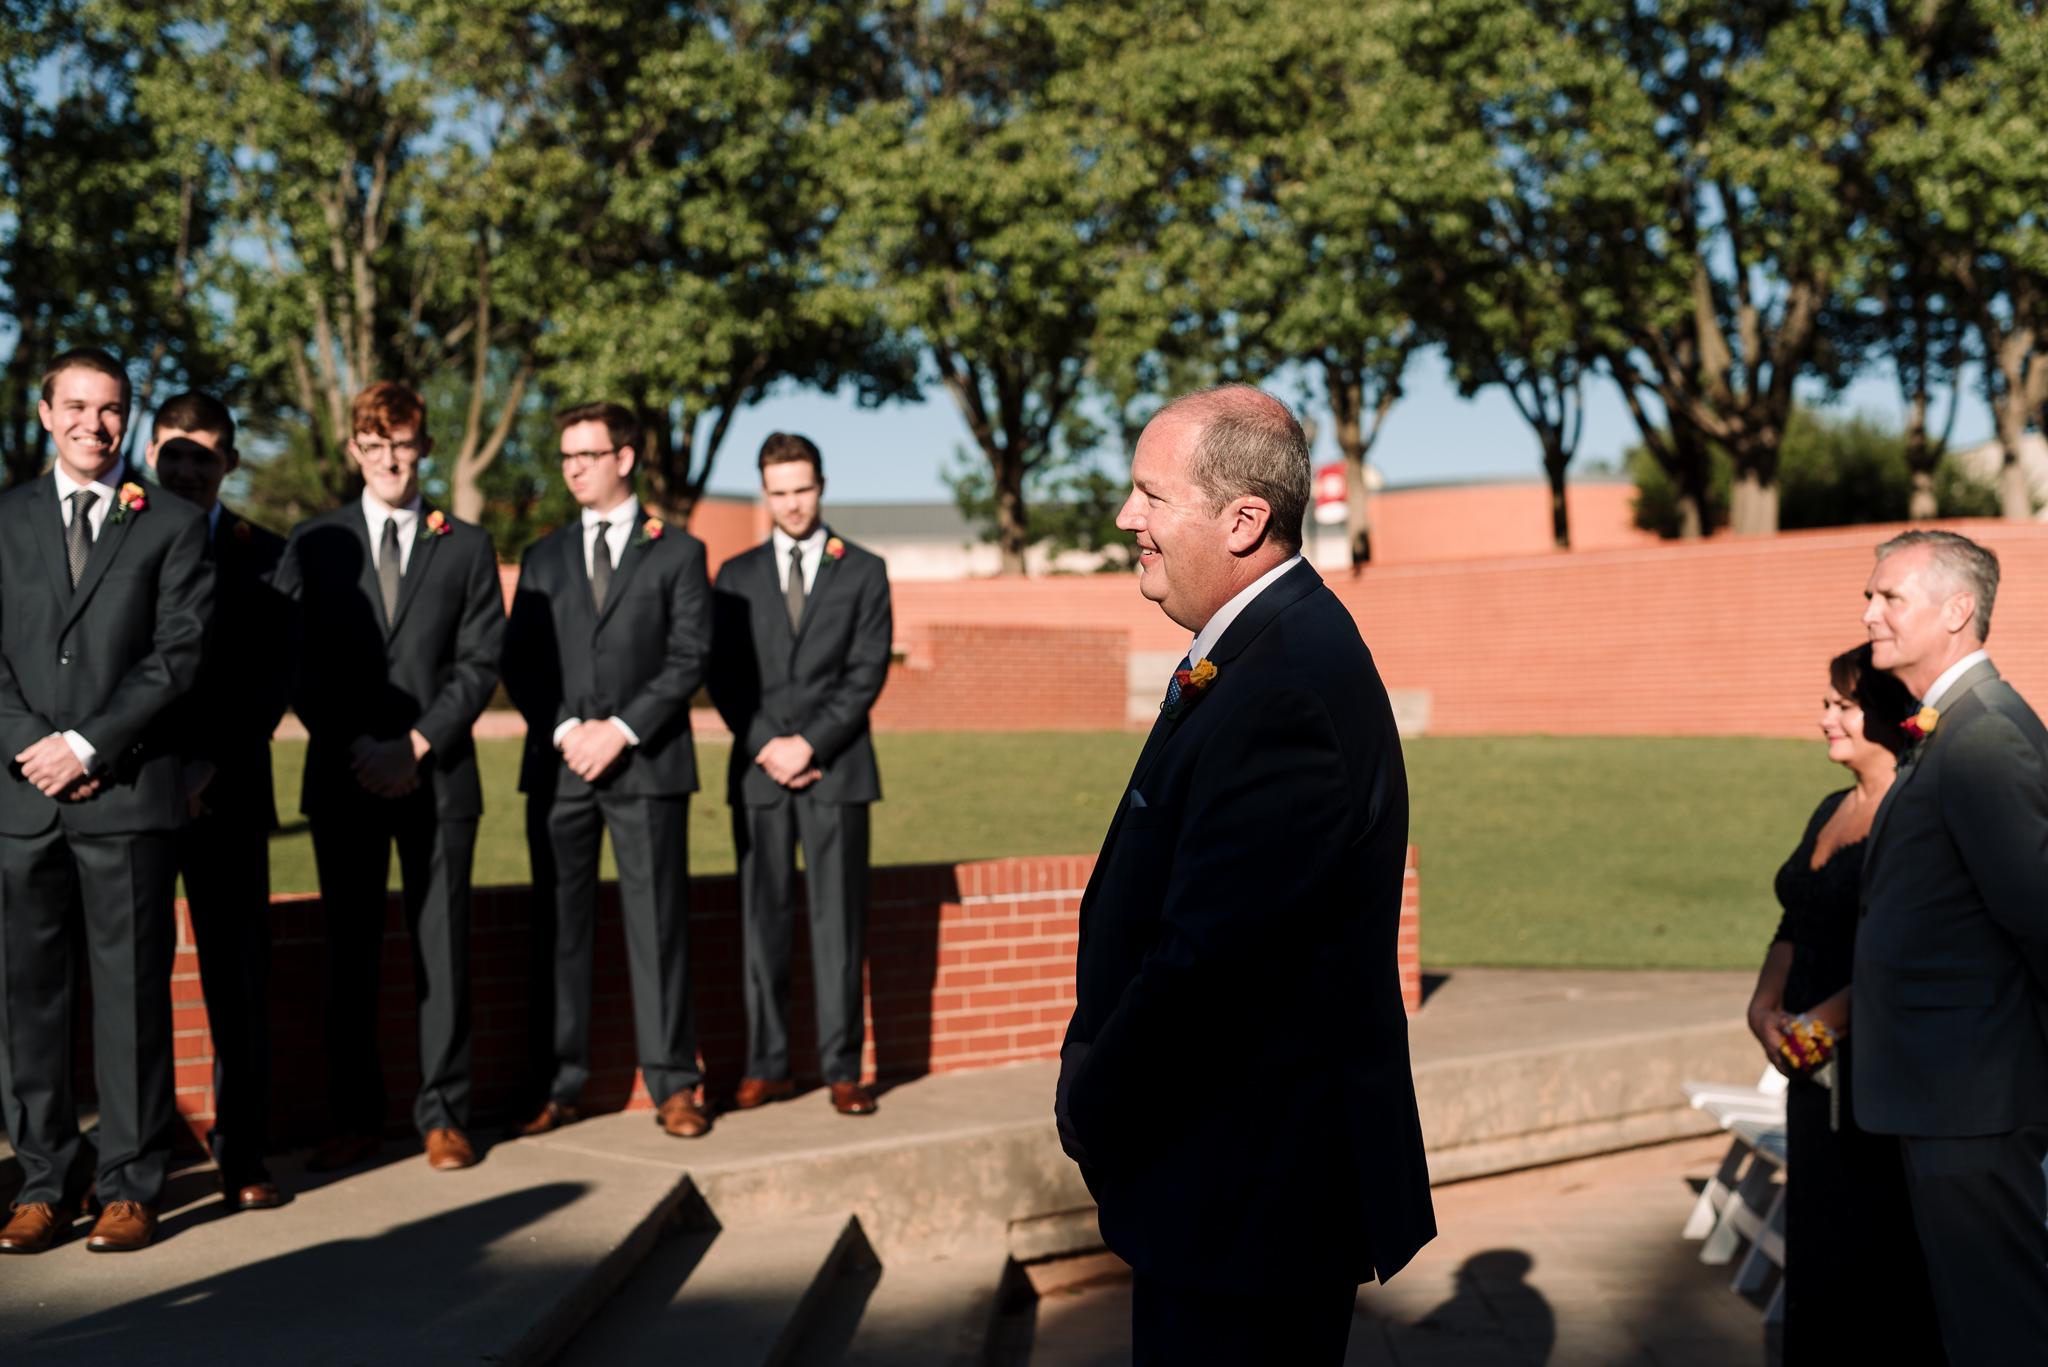 Oklahoma-Christian-University-Wedding-8190.jpg